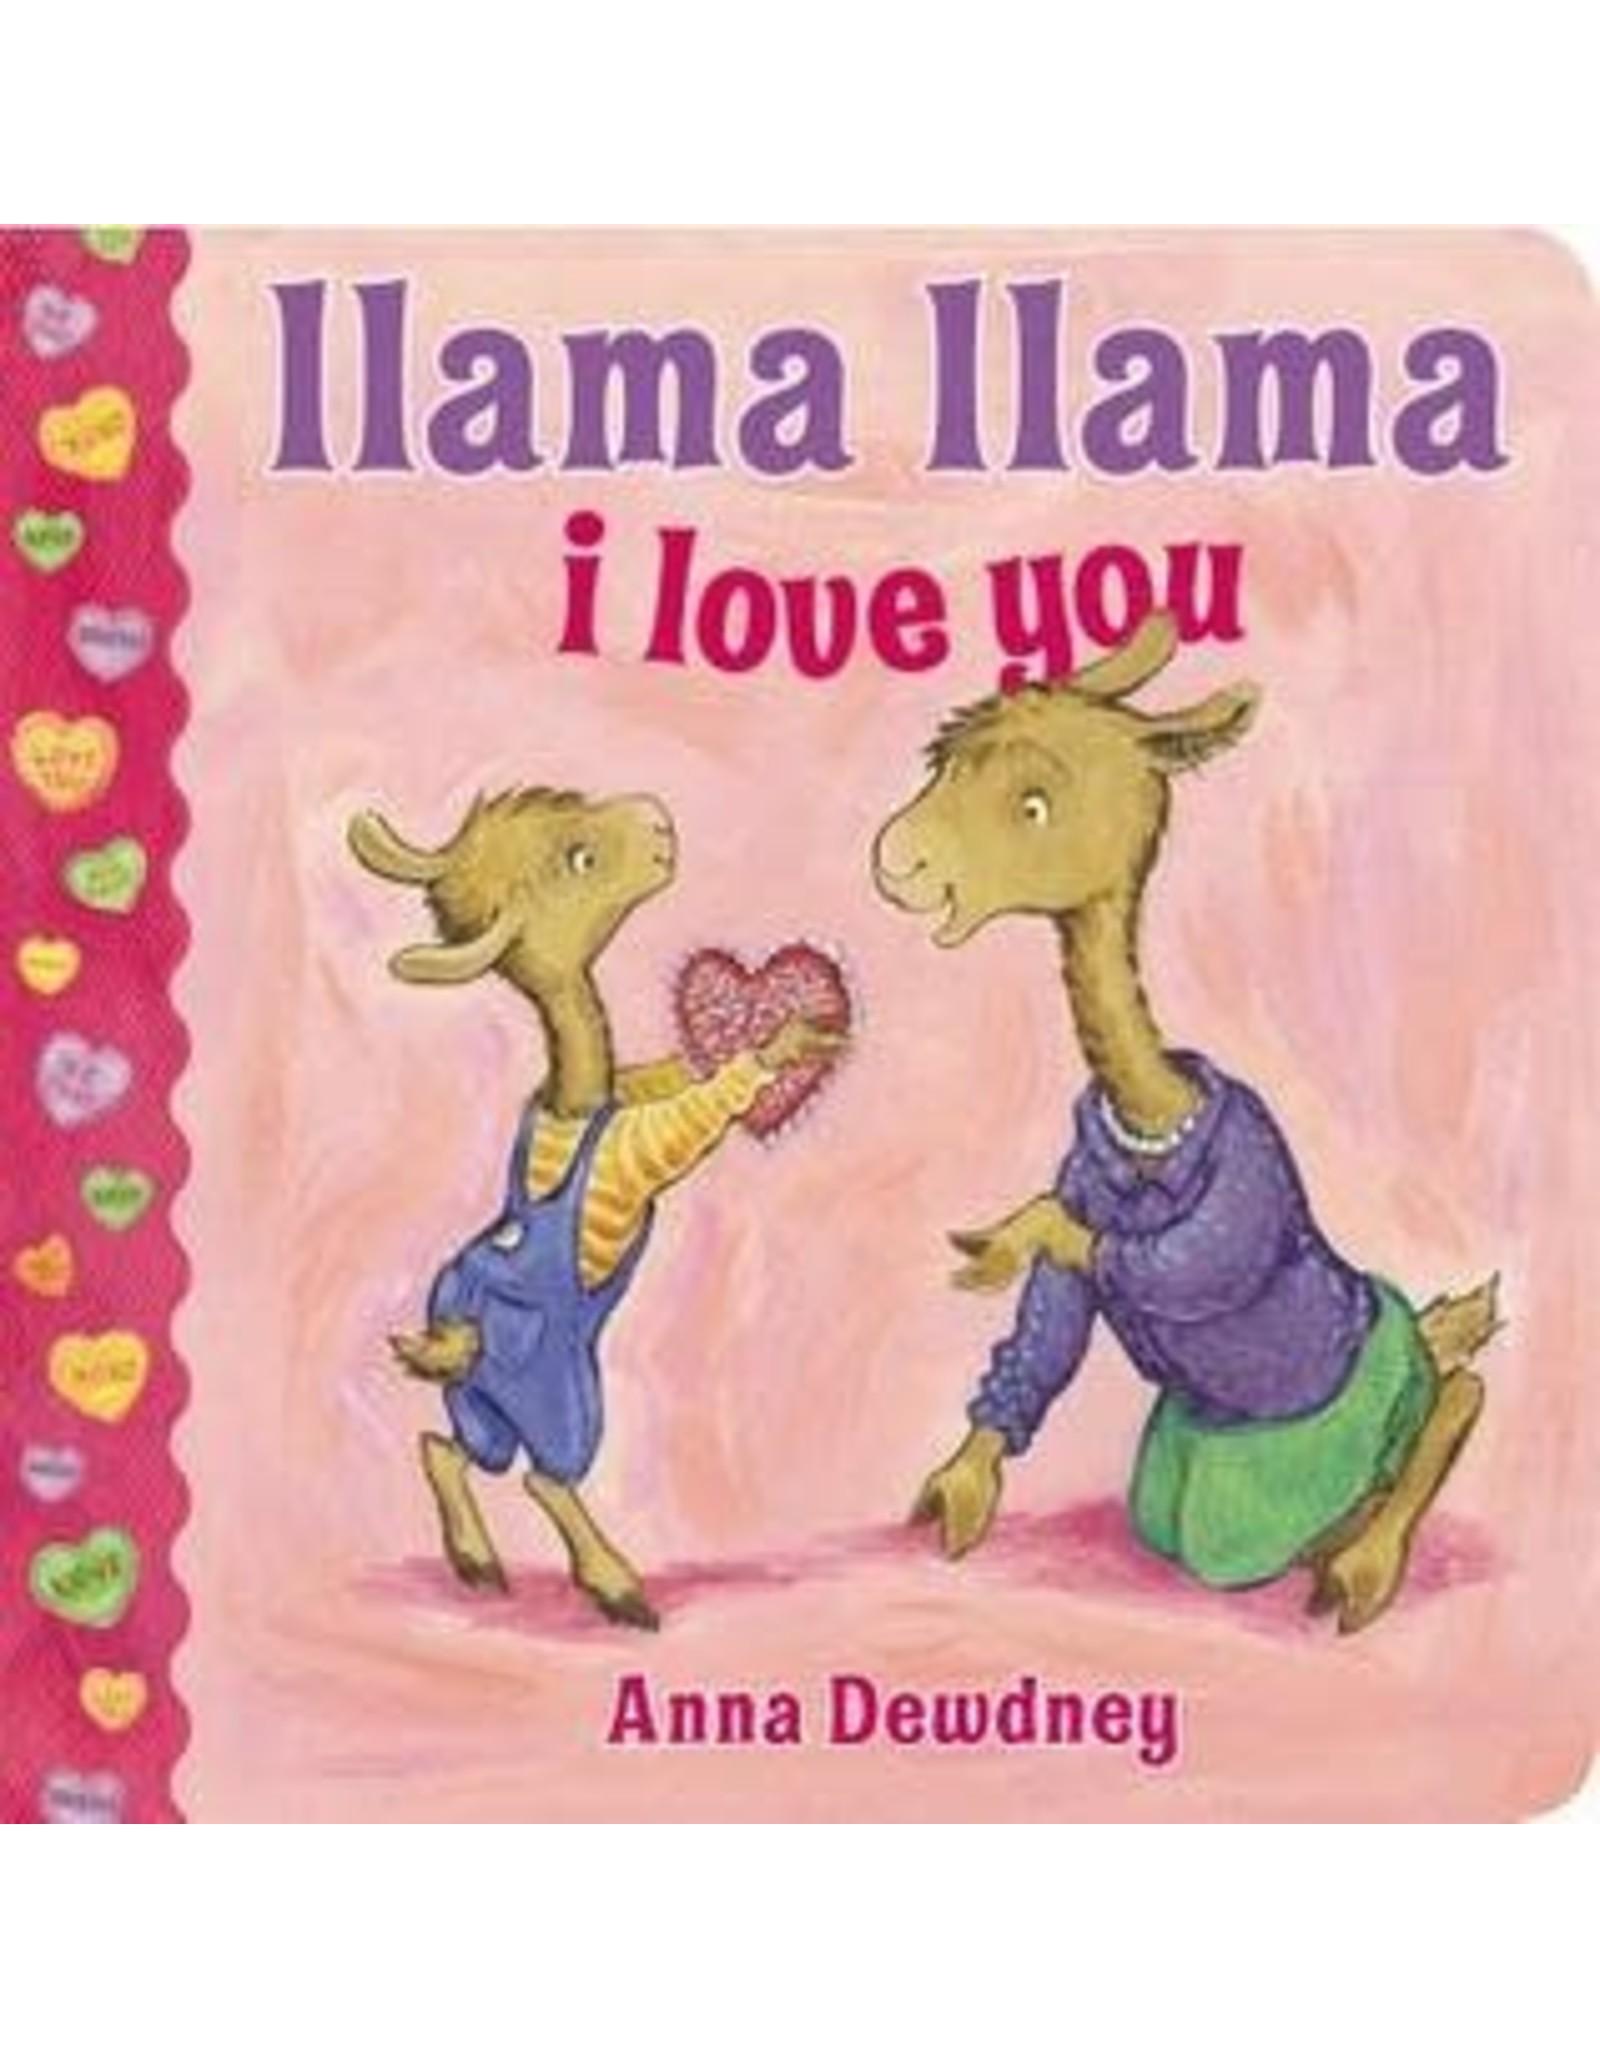 Penguin Random House Llama Llama I Love You